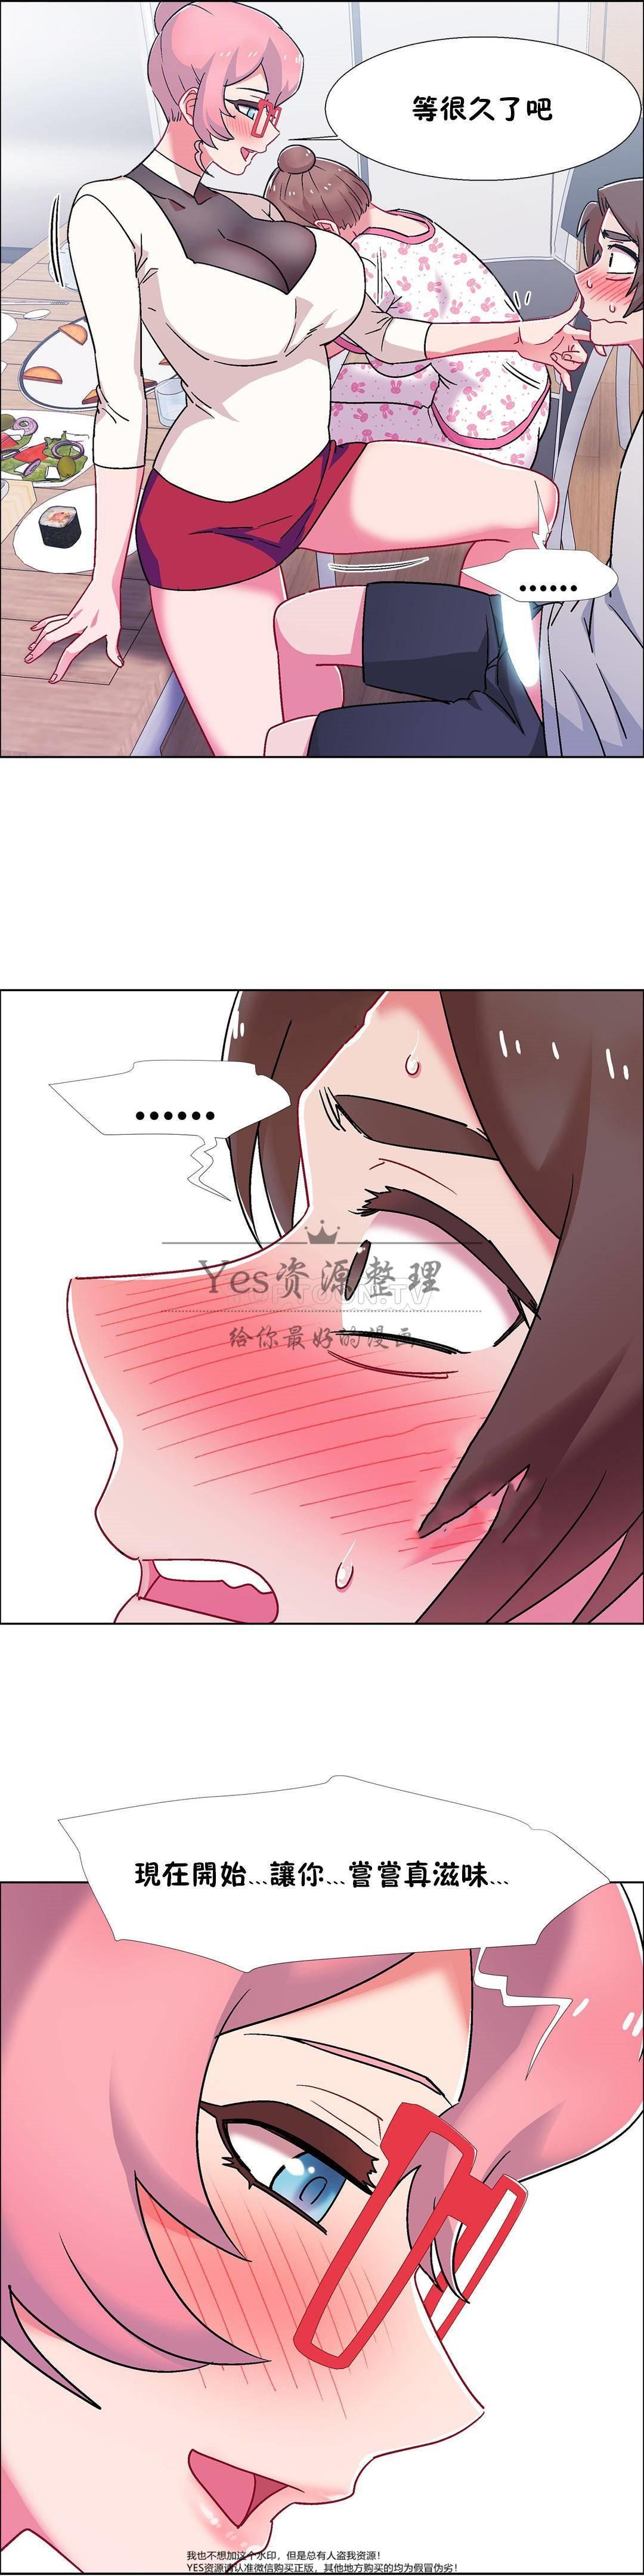 [Studio Wannabe] Rental Girls | 出租女郎 Ch. 33-58 [Chinese]  第二季 完结 581